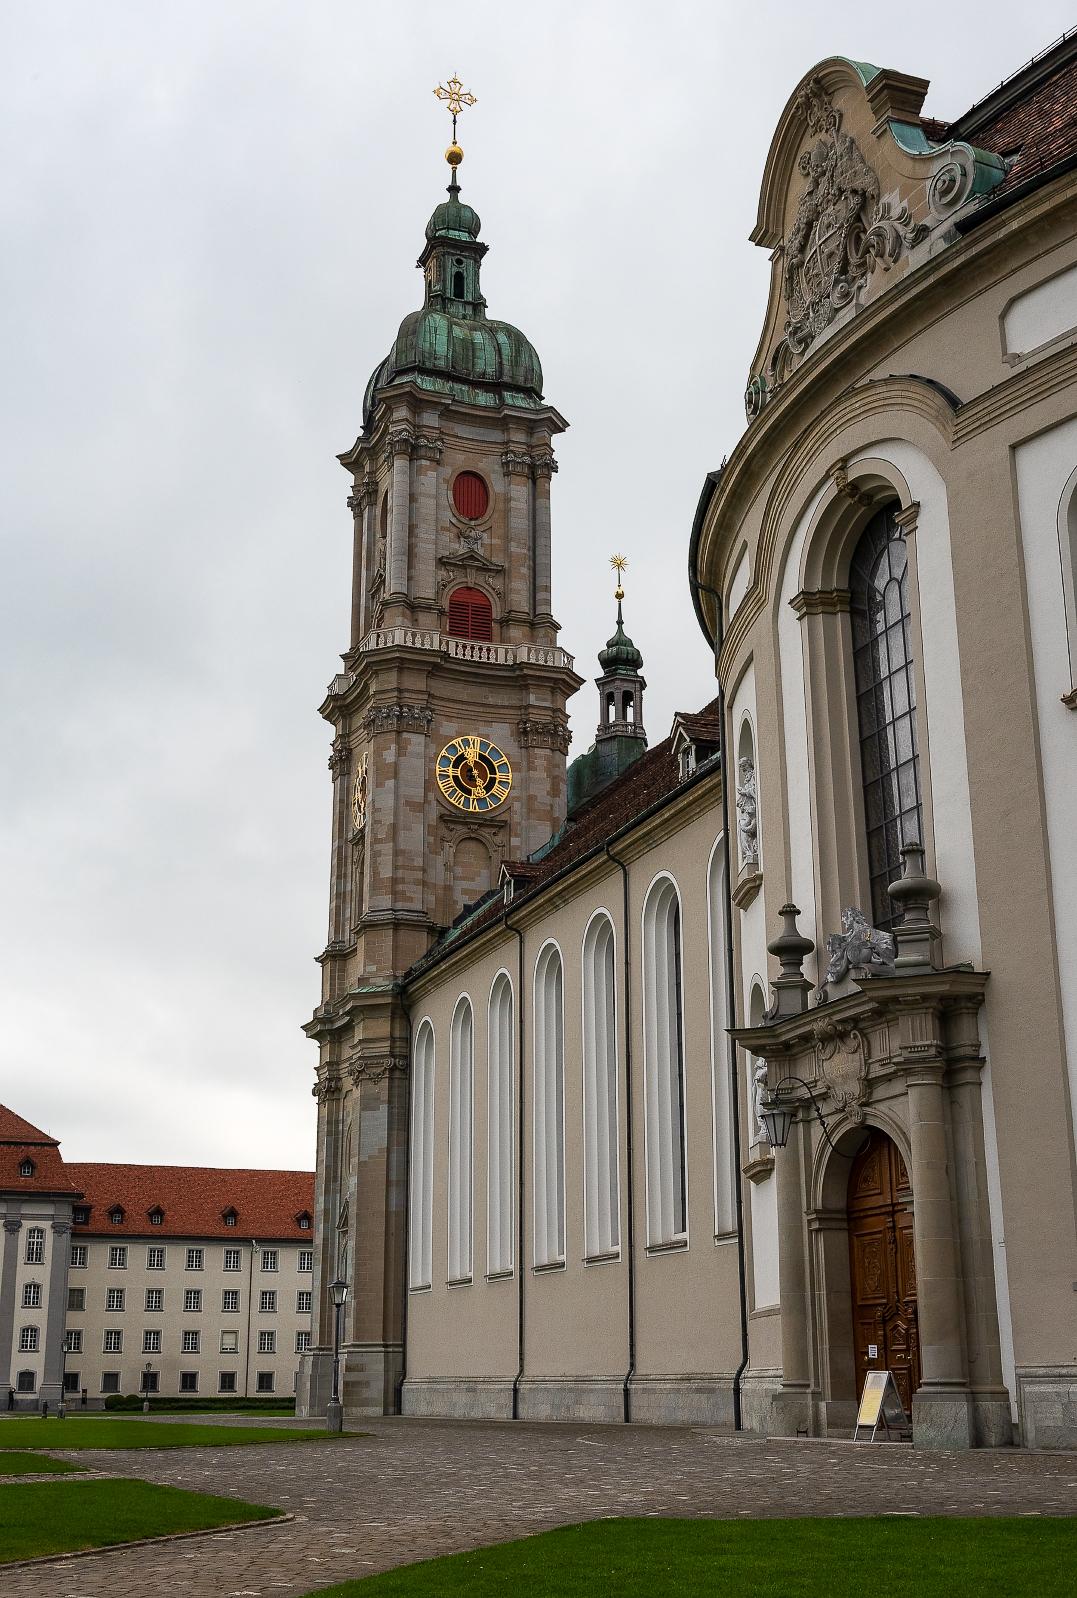 The Monastery of St Gallen in St. Gallen, Switzerland.